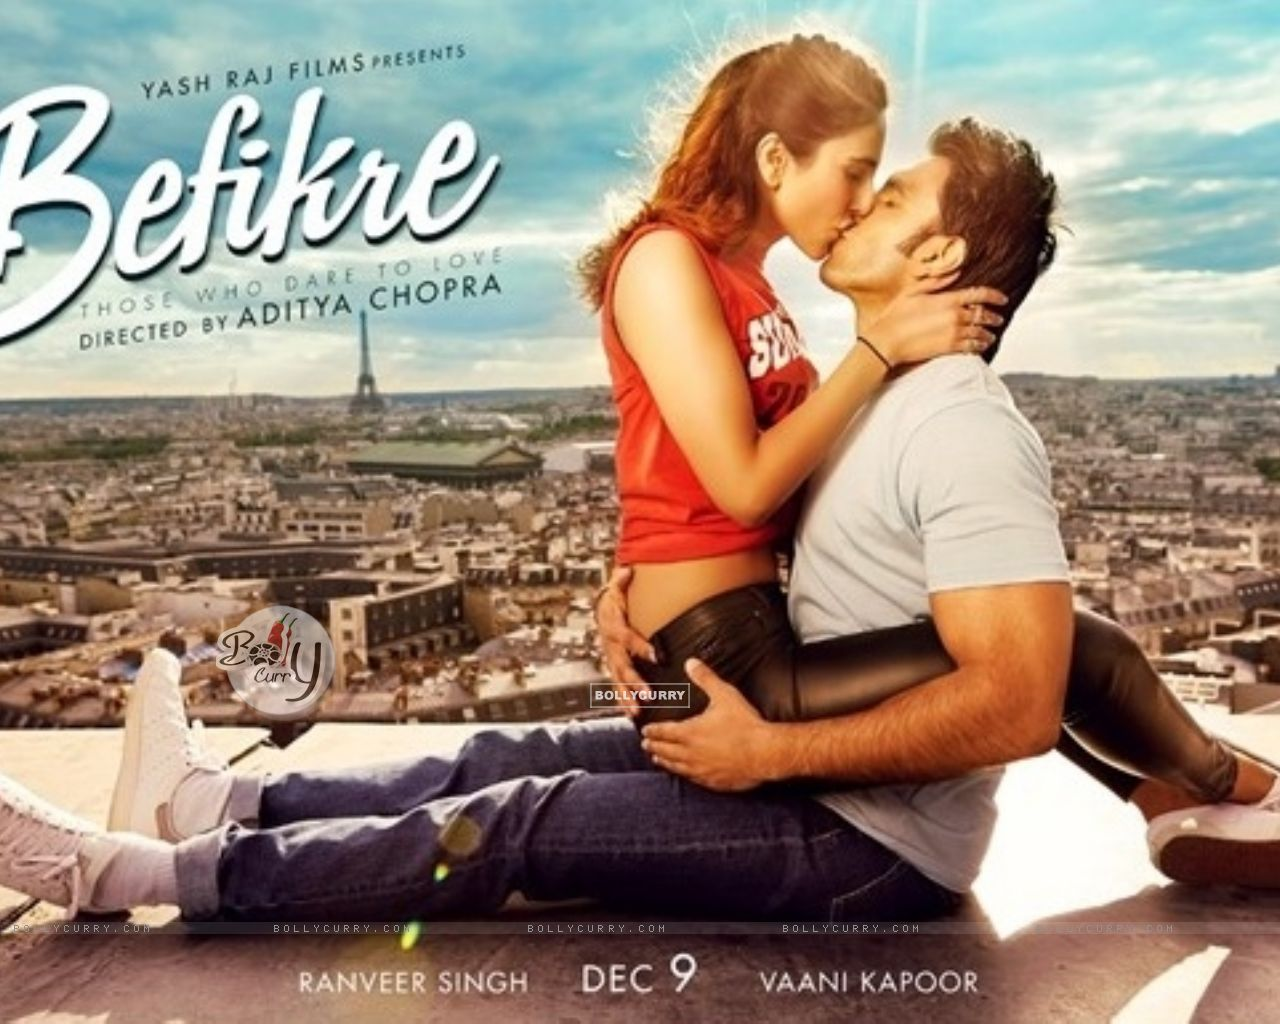 Poster of the film Befikre (405802) size:1280x1024